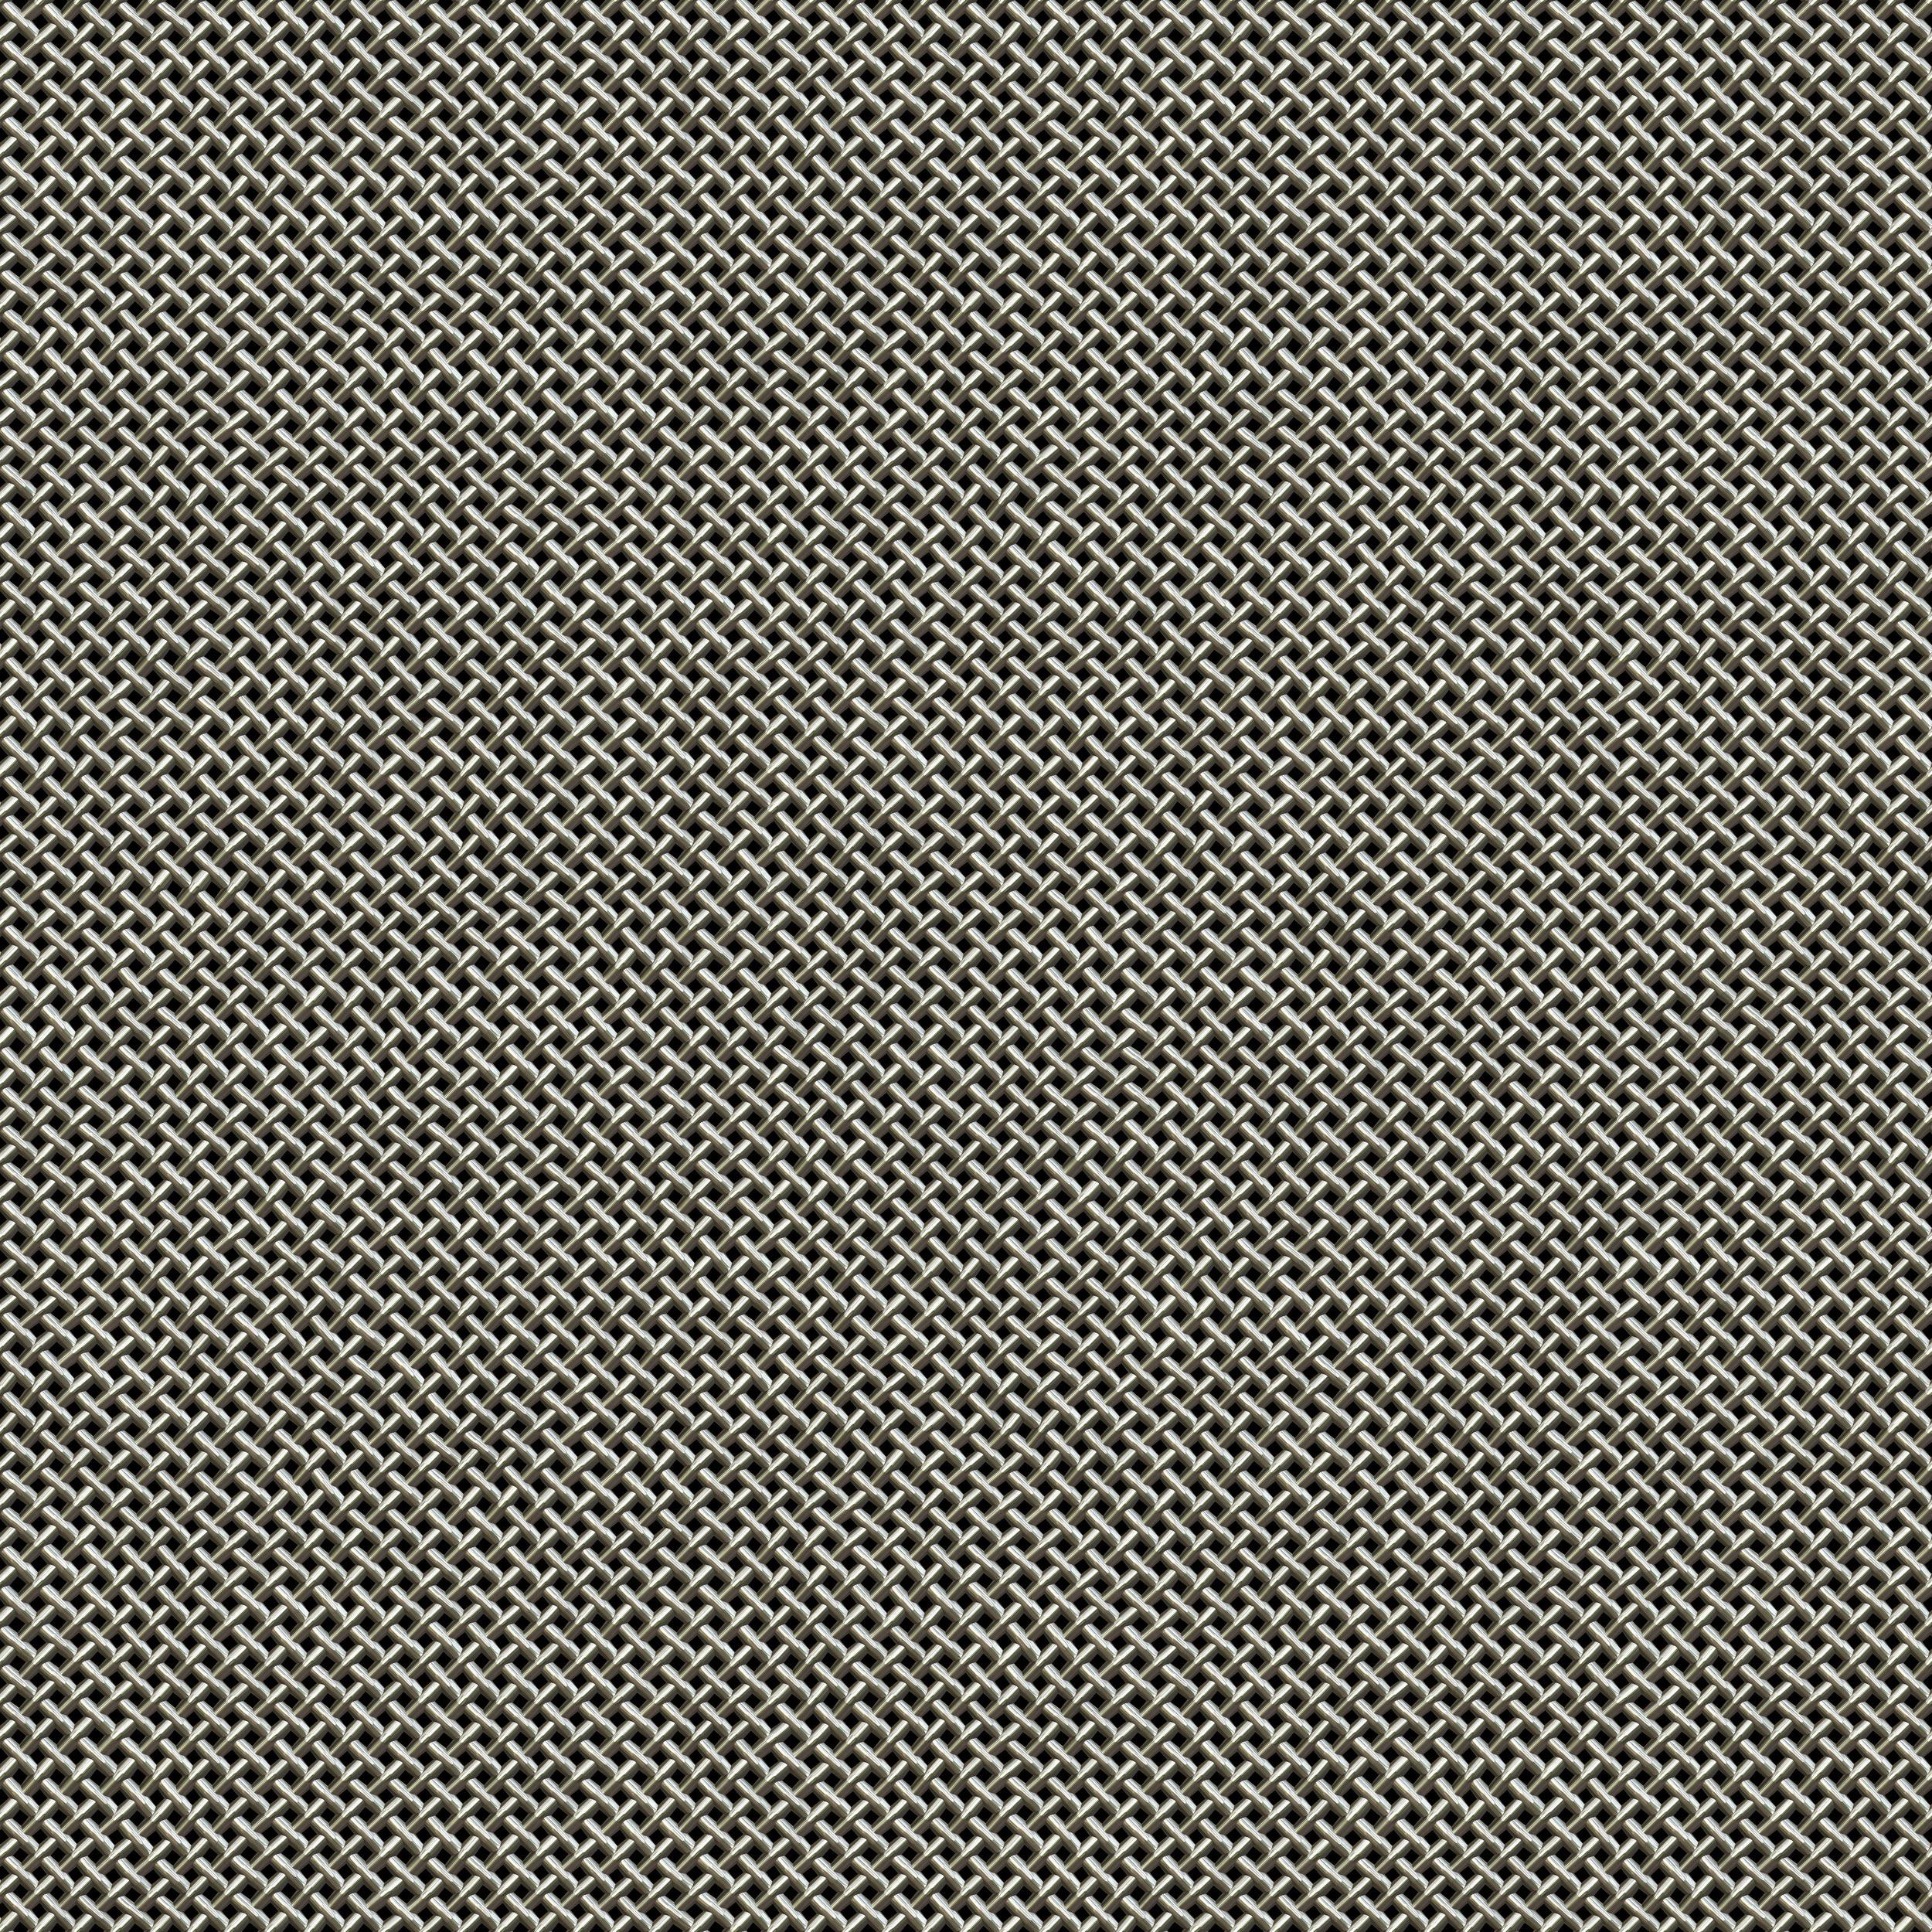 Wire-Mesh-Metal-Texture.jpg